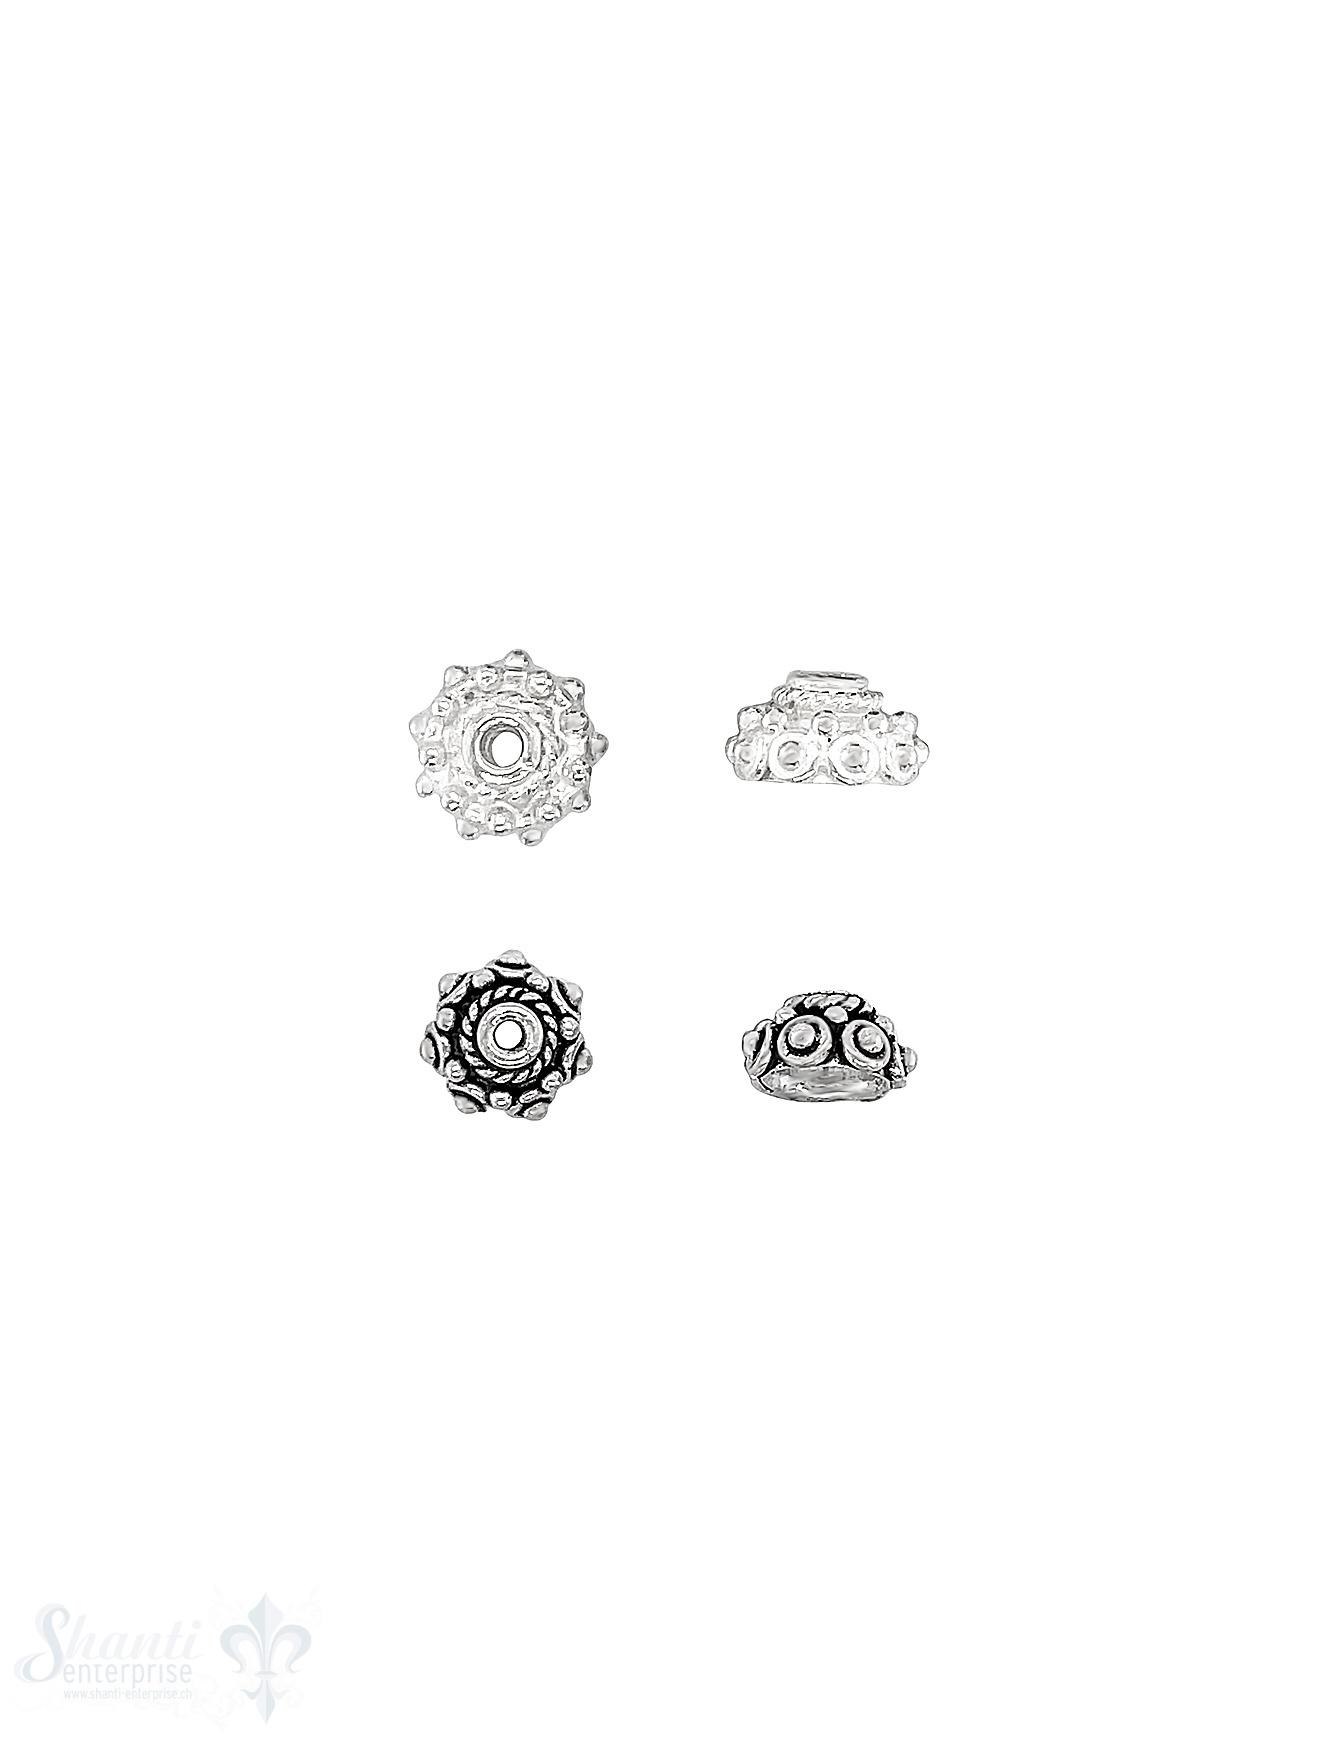 Noppen Perlkappe eingekreist Doppelrand verziert Silber 925